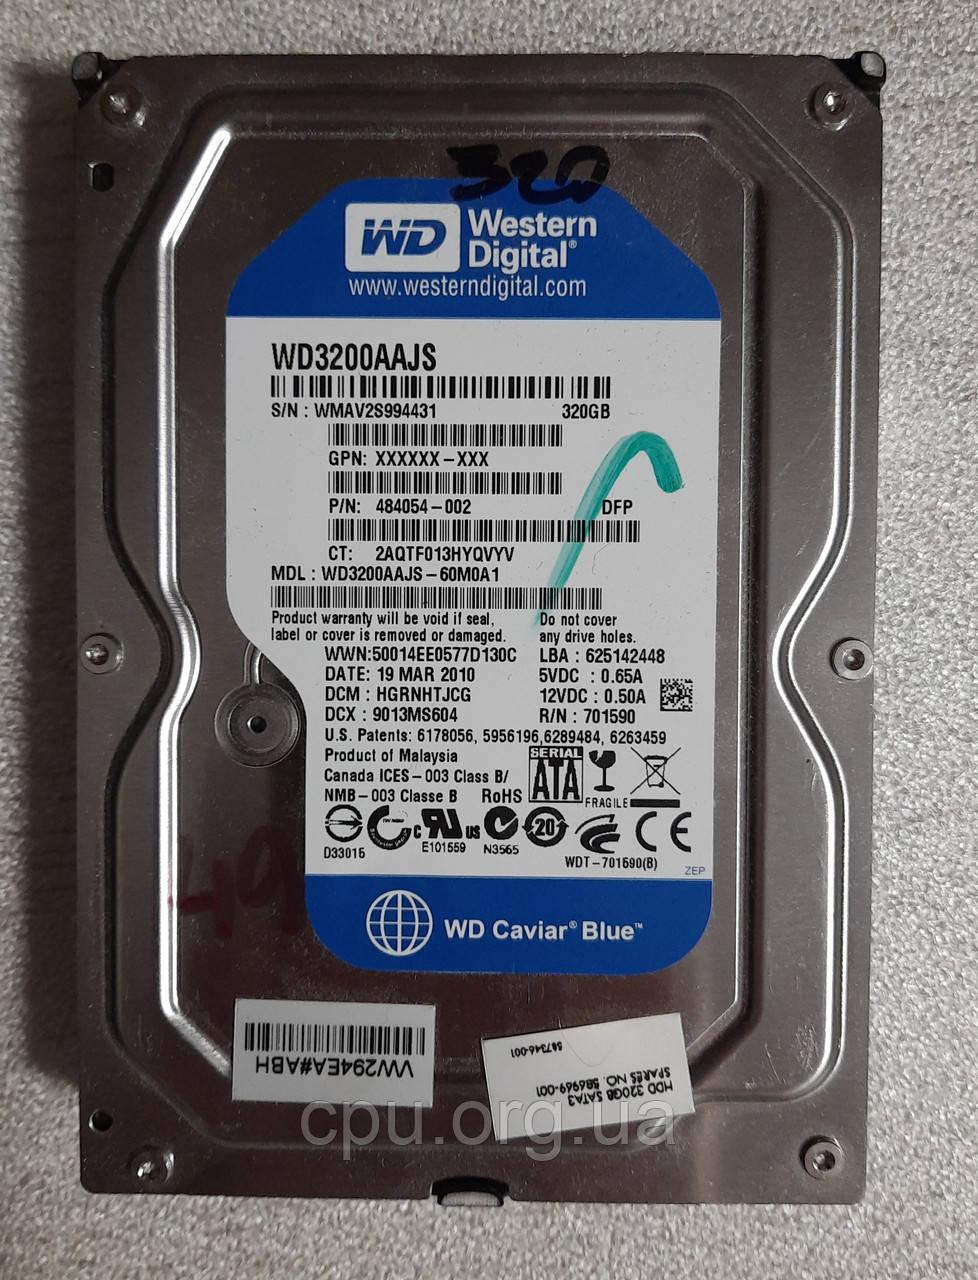 Жесткий диск HDD 3.5 320GB WD WD3200AAJS 8M 7200 об/мин